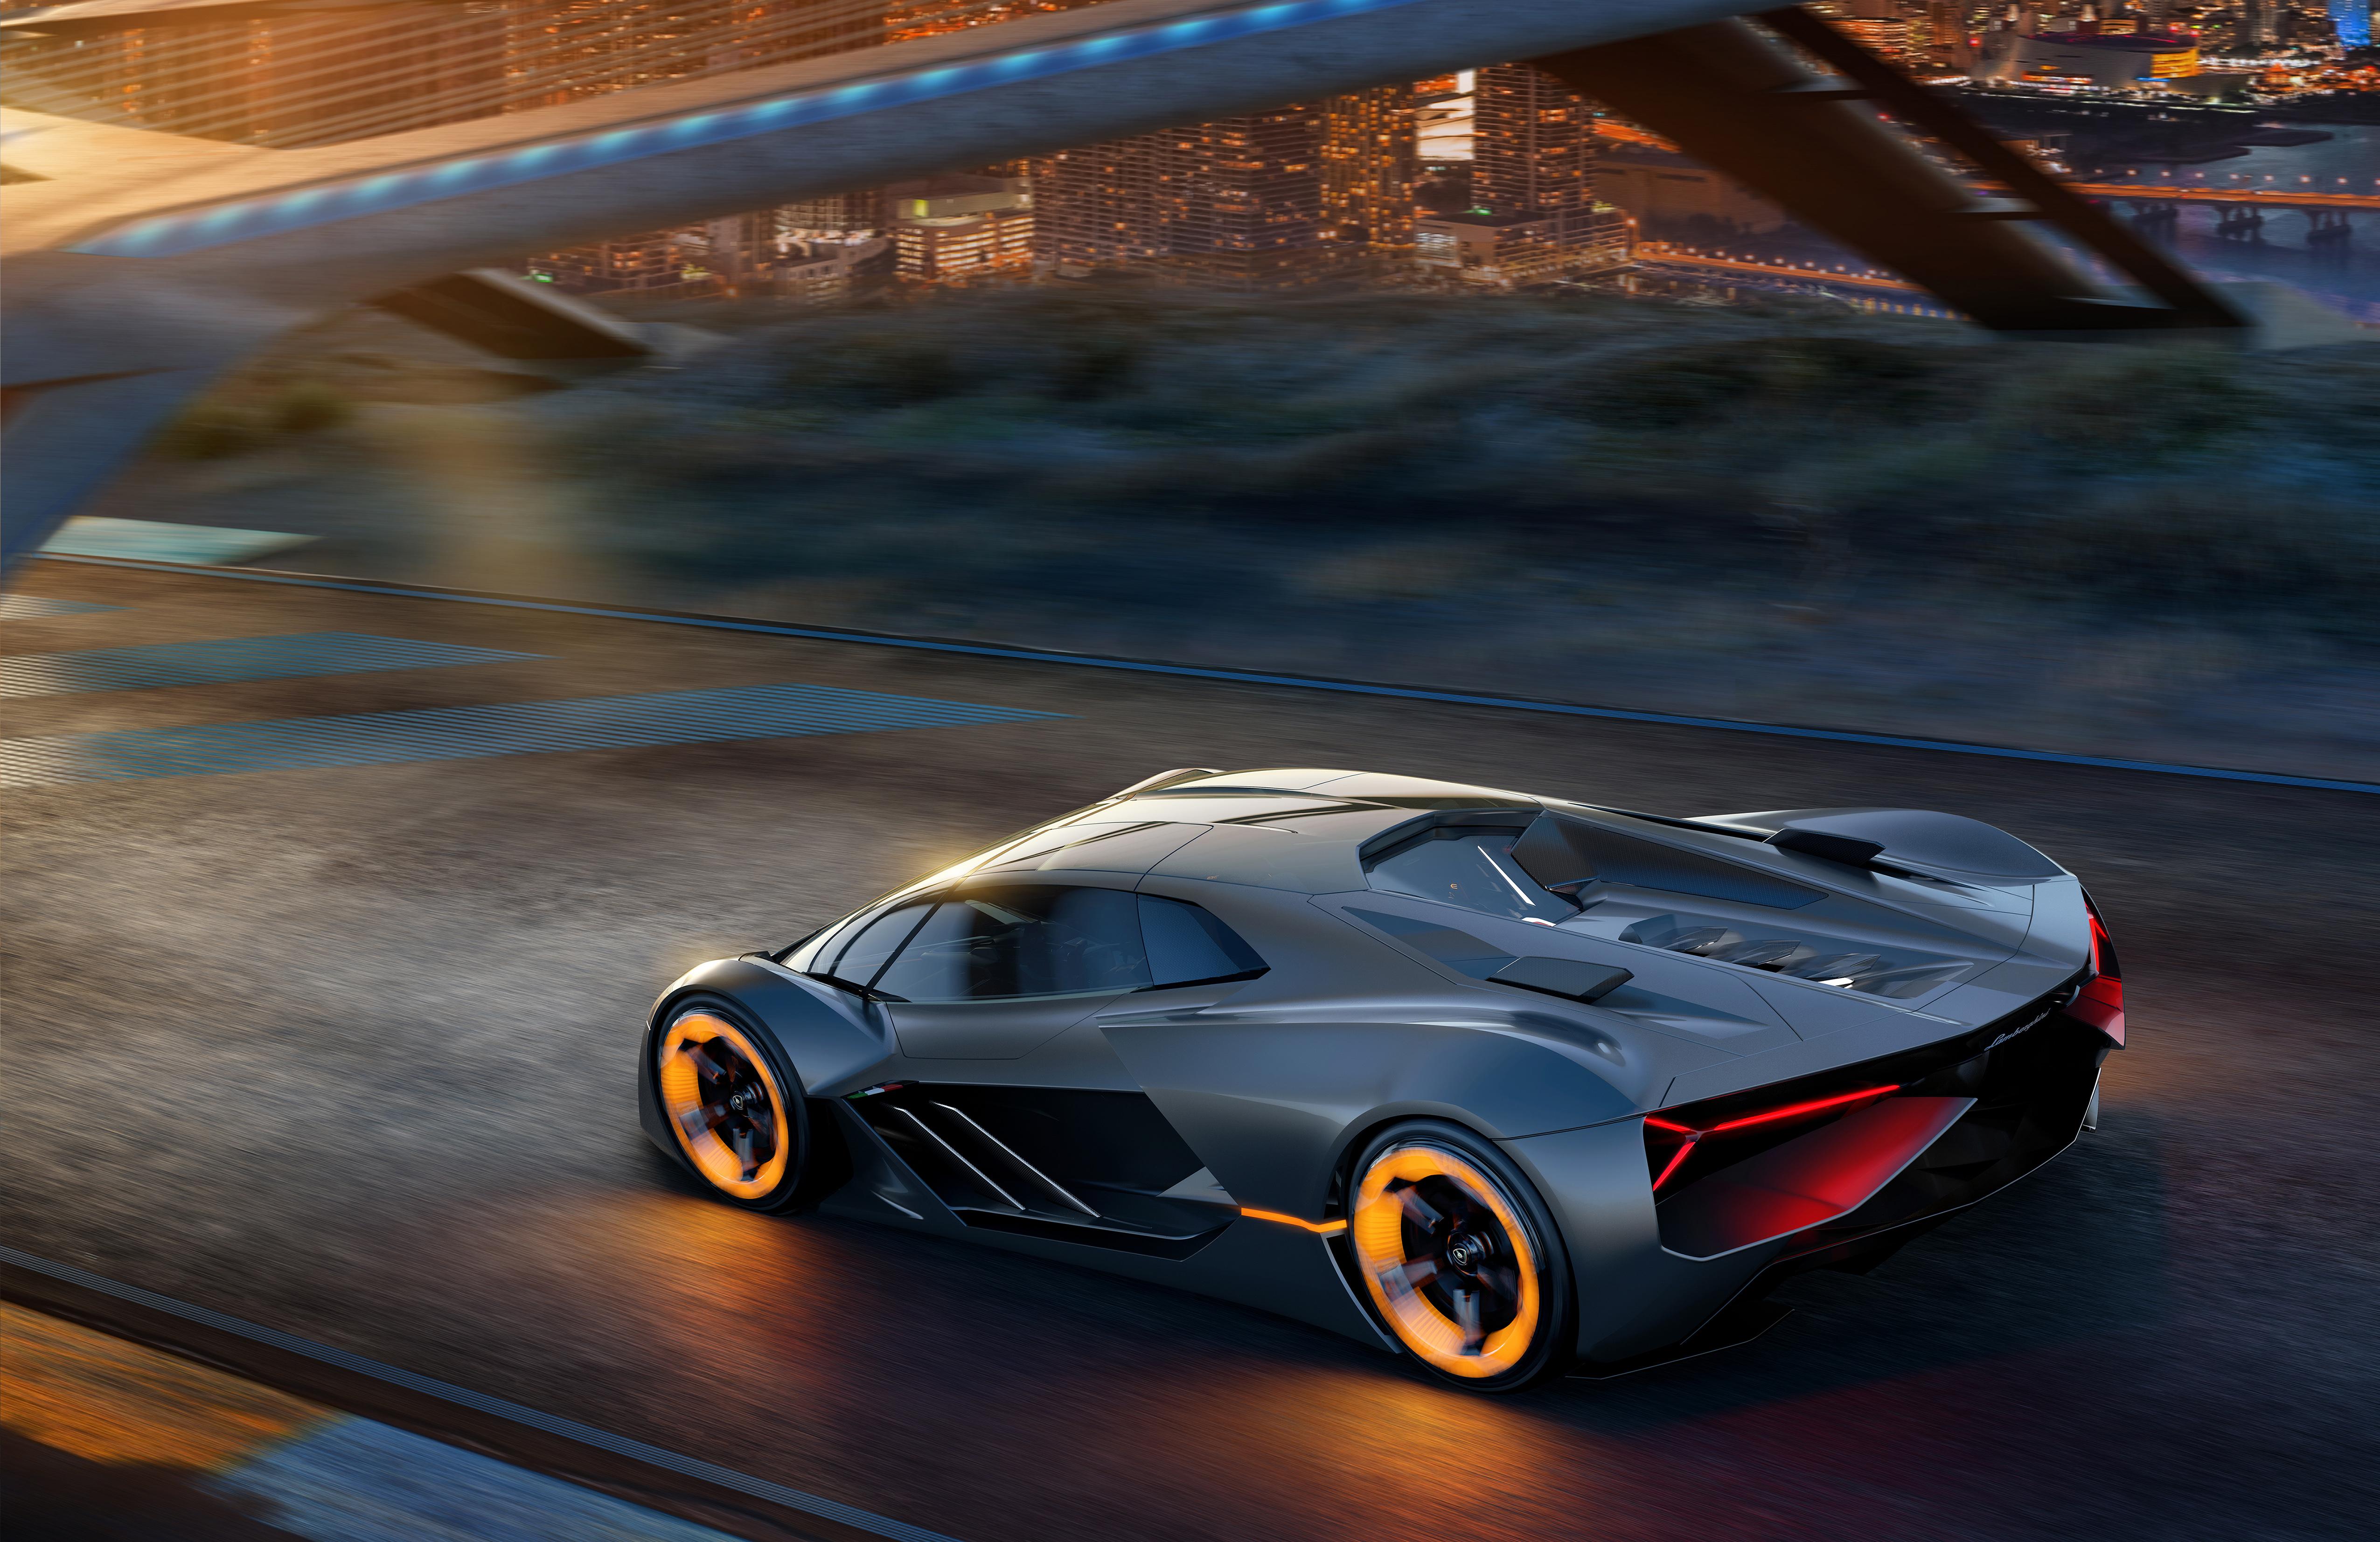 Lamborghini Unveils New Insane Looking Electric Supercar Concept